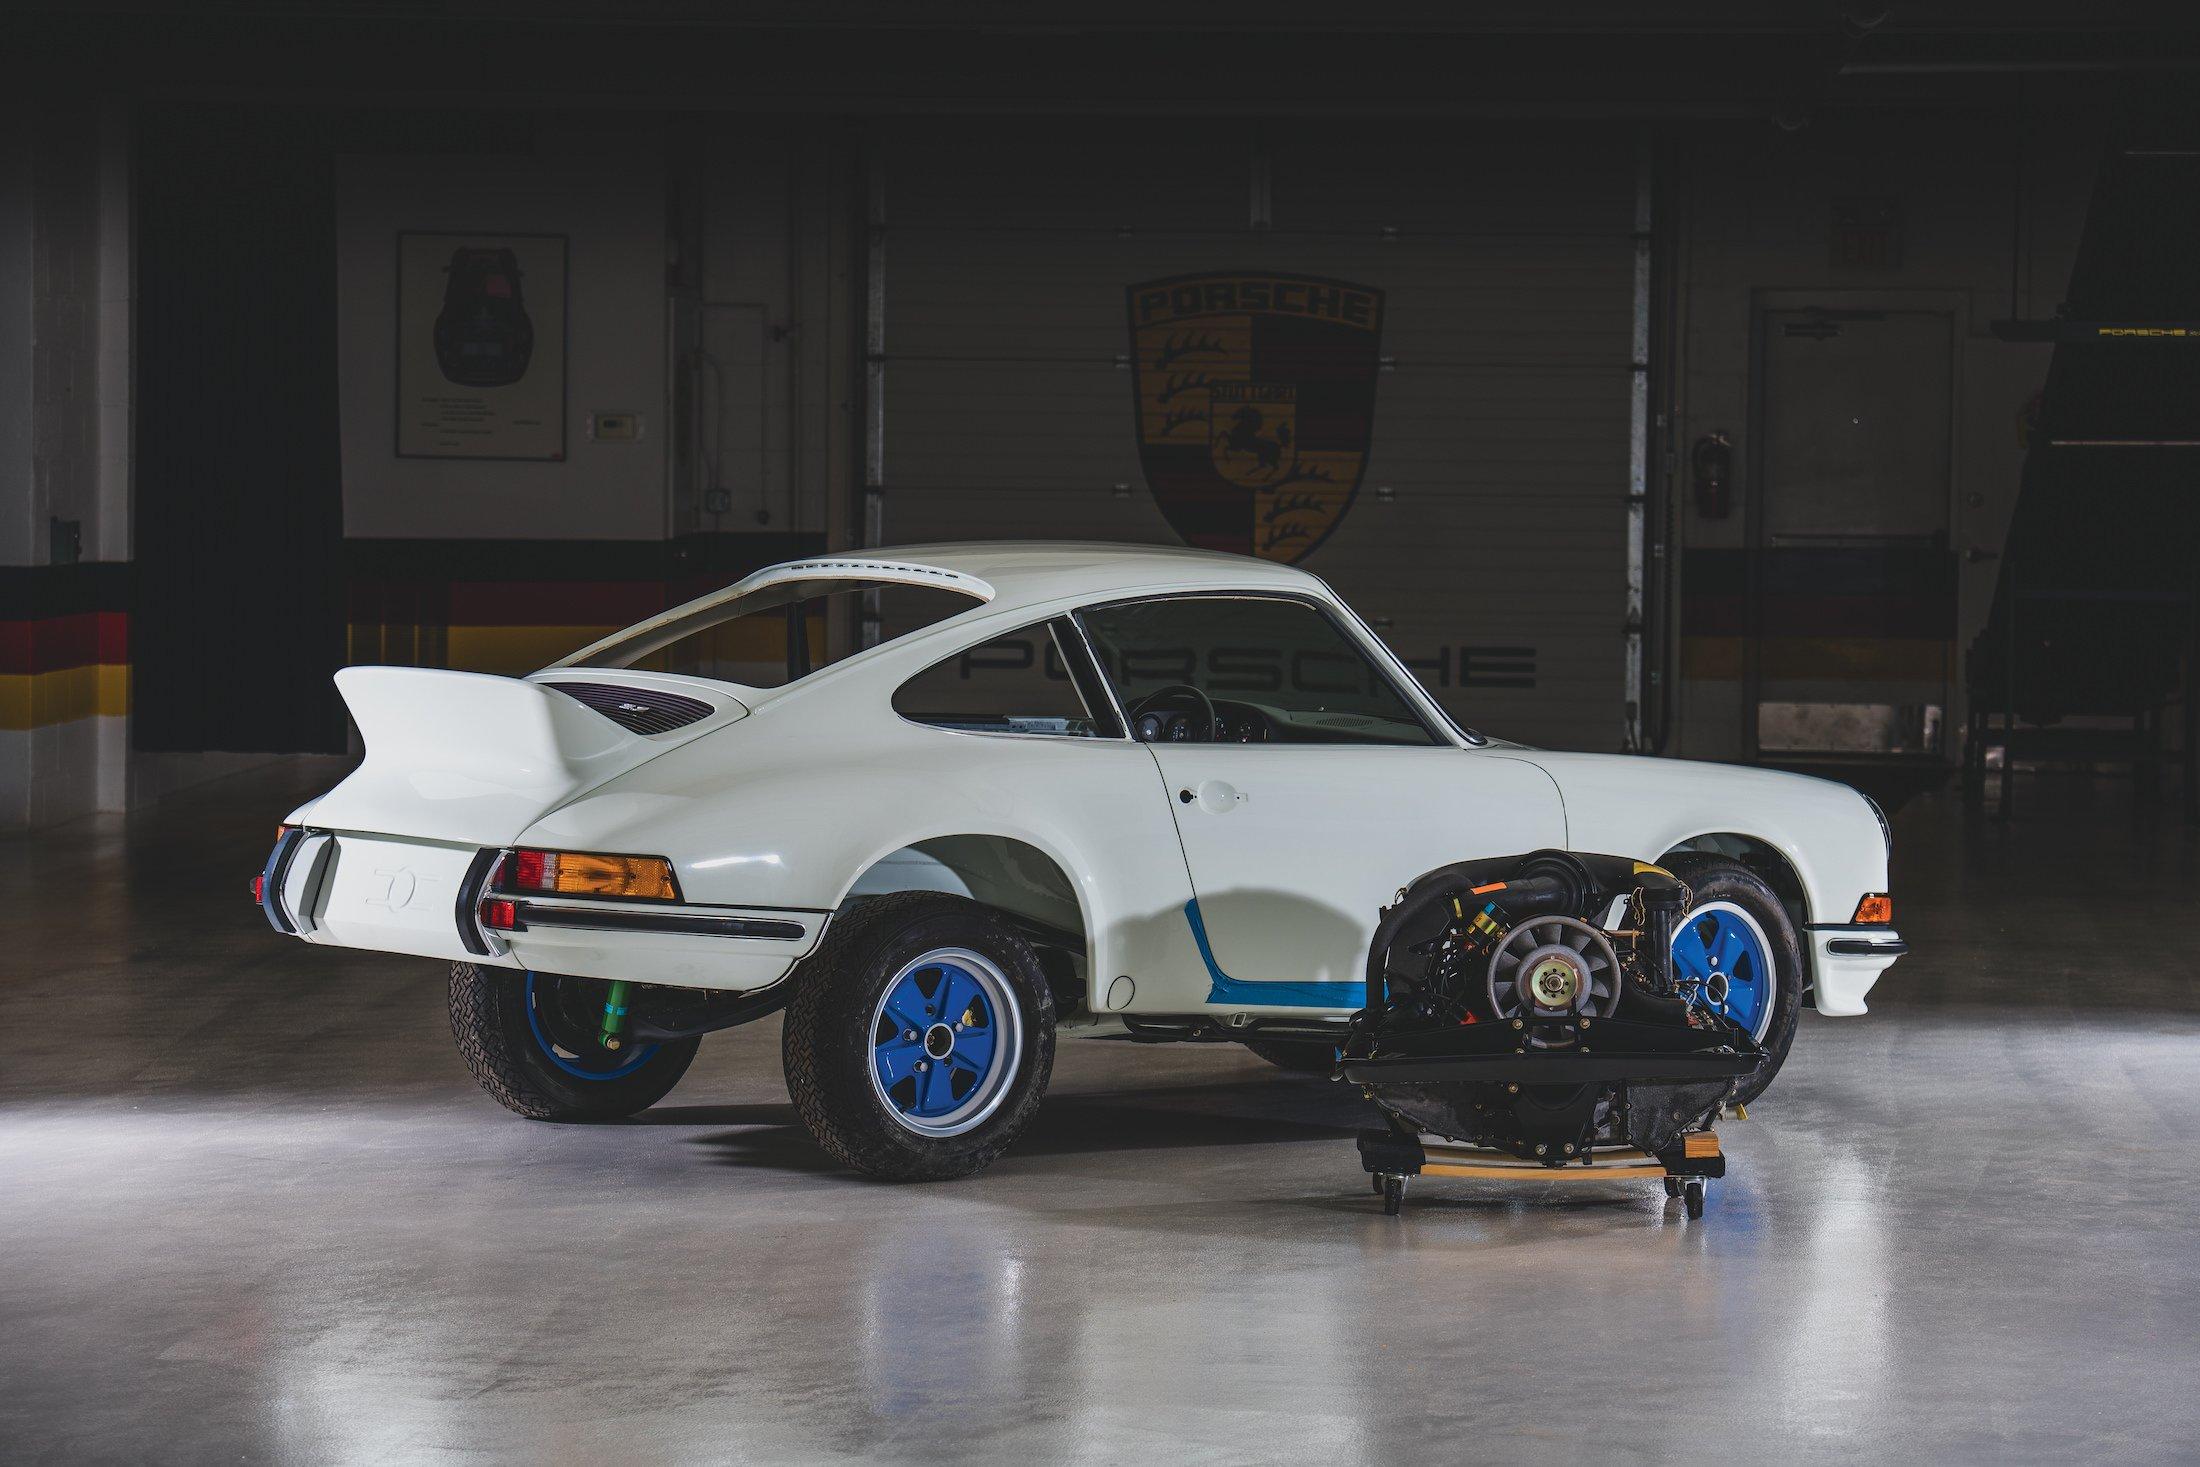 Half Million Dollar Project Car An Original 1973 Porsche 911 Carrera Rs 2 7